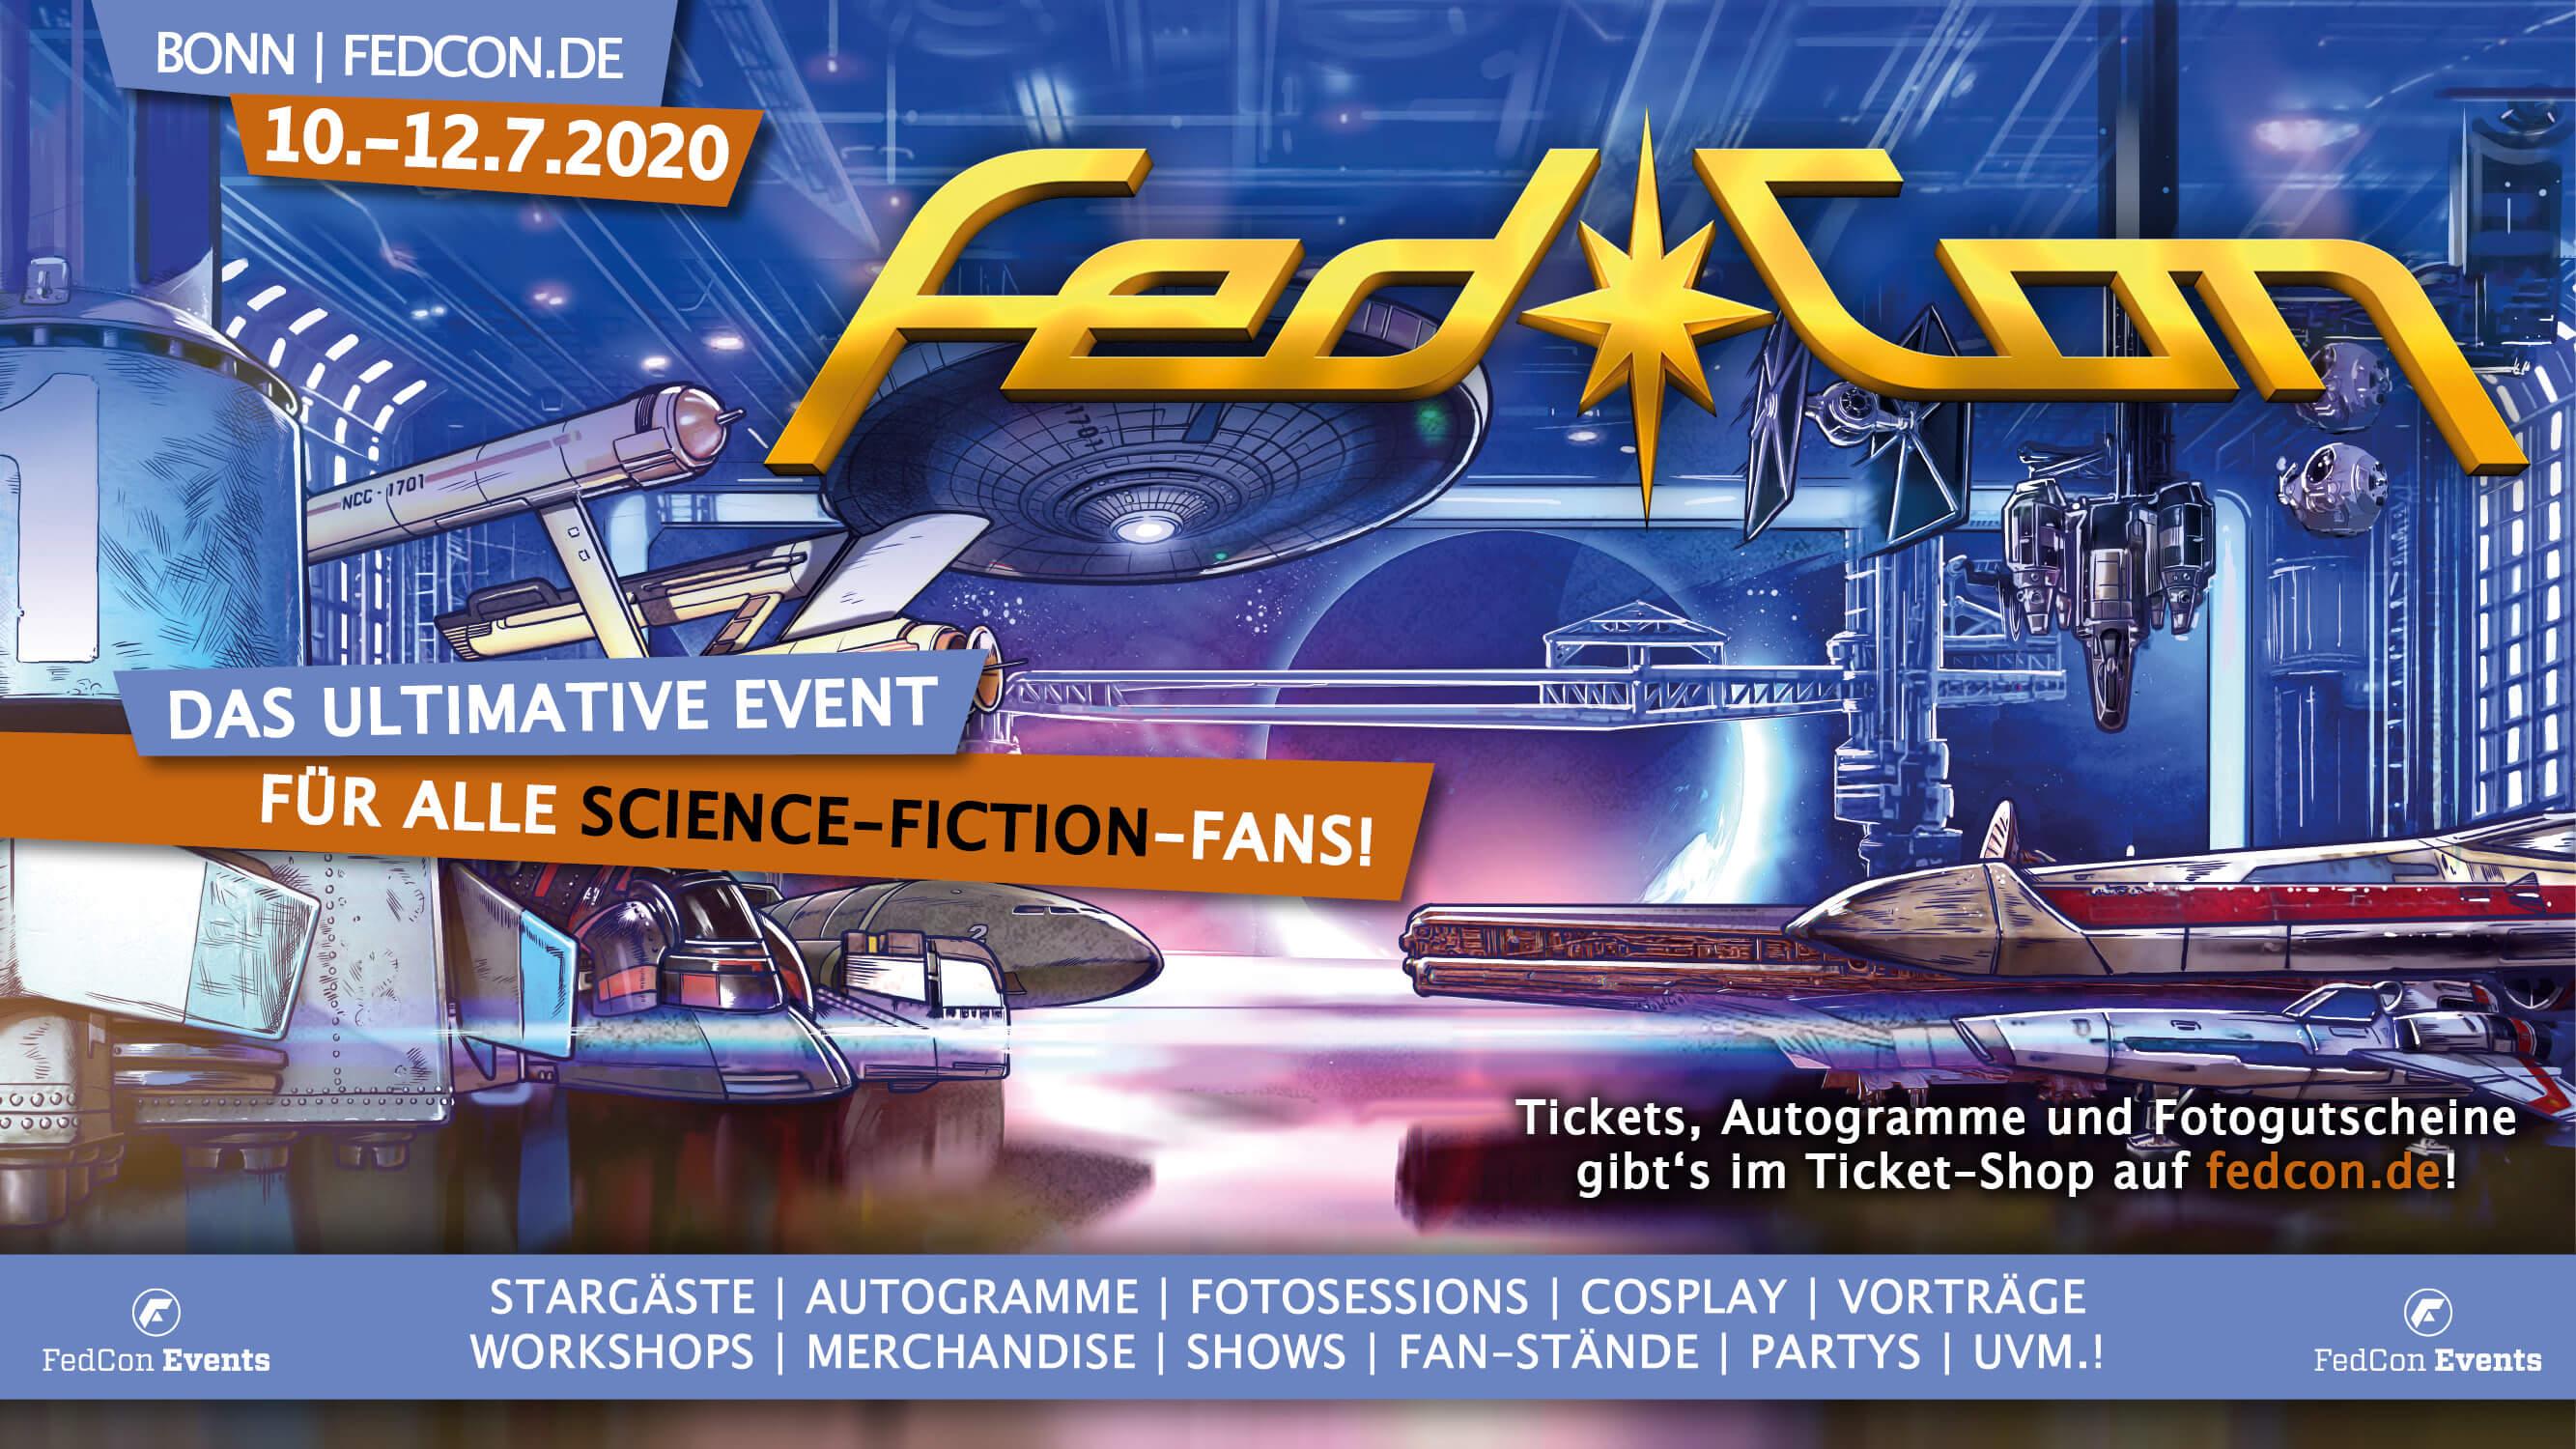 FedCon 2020